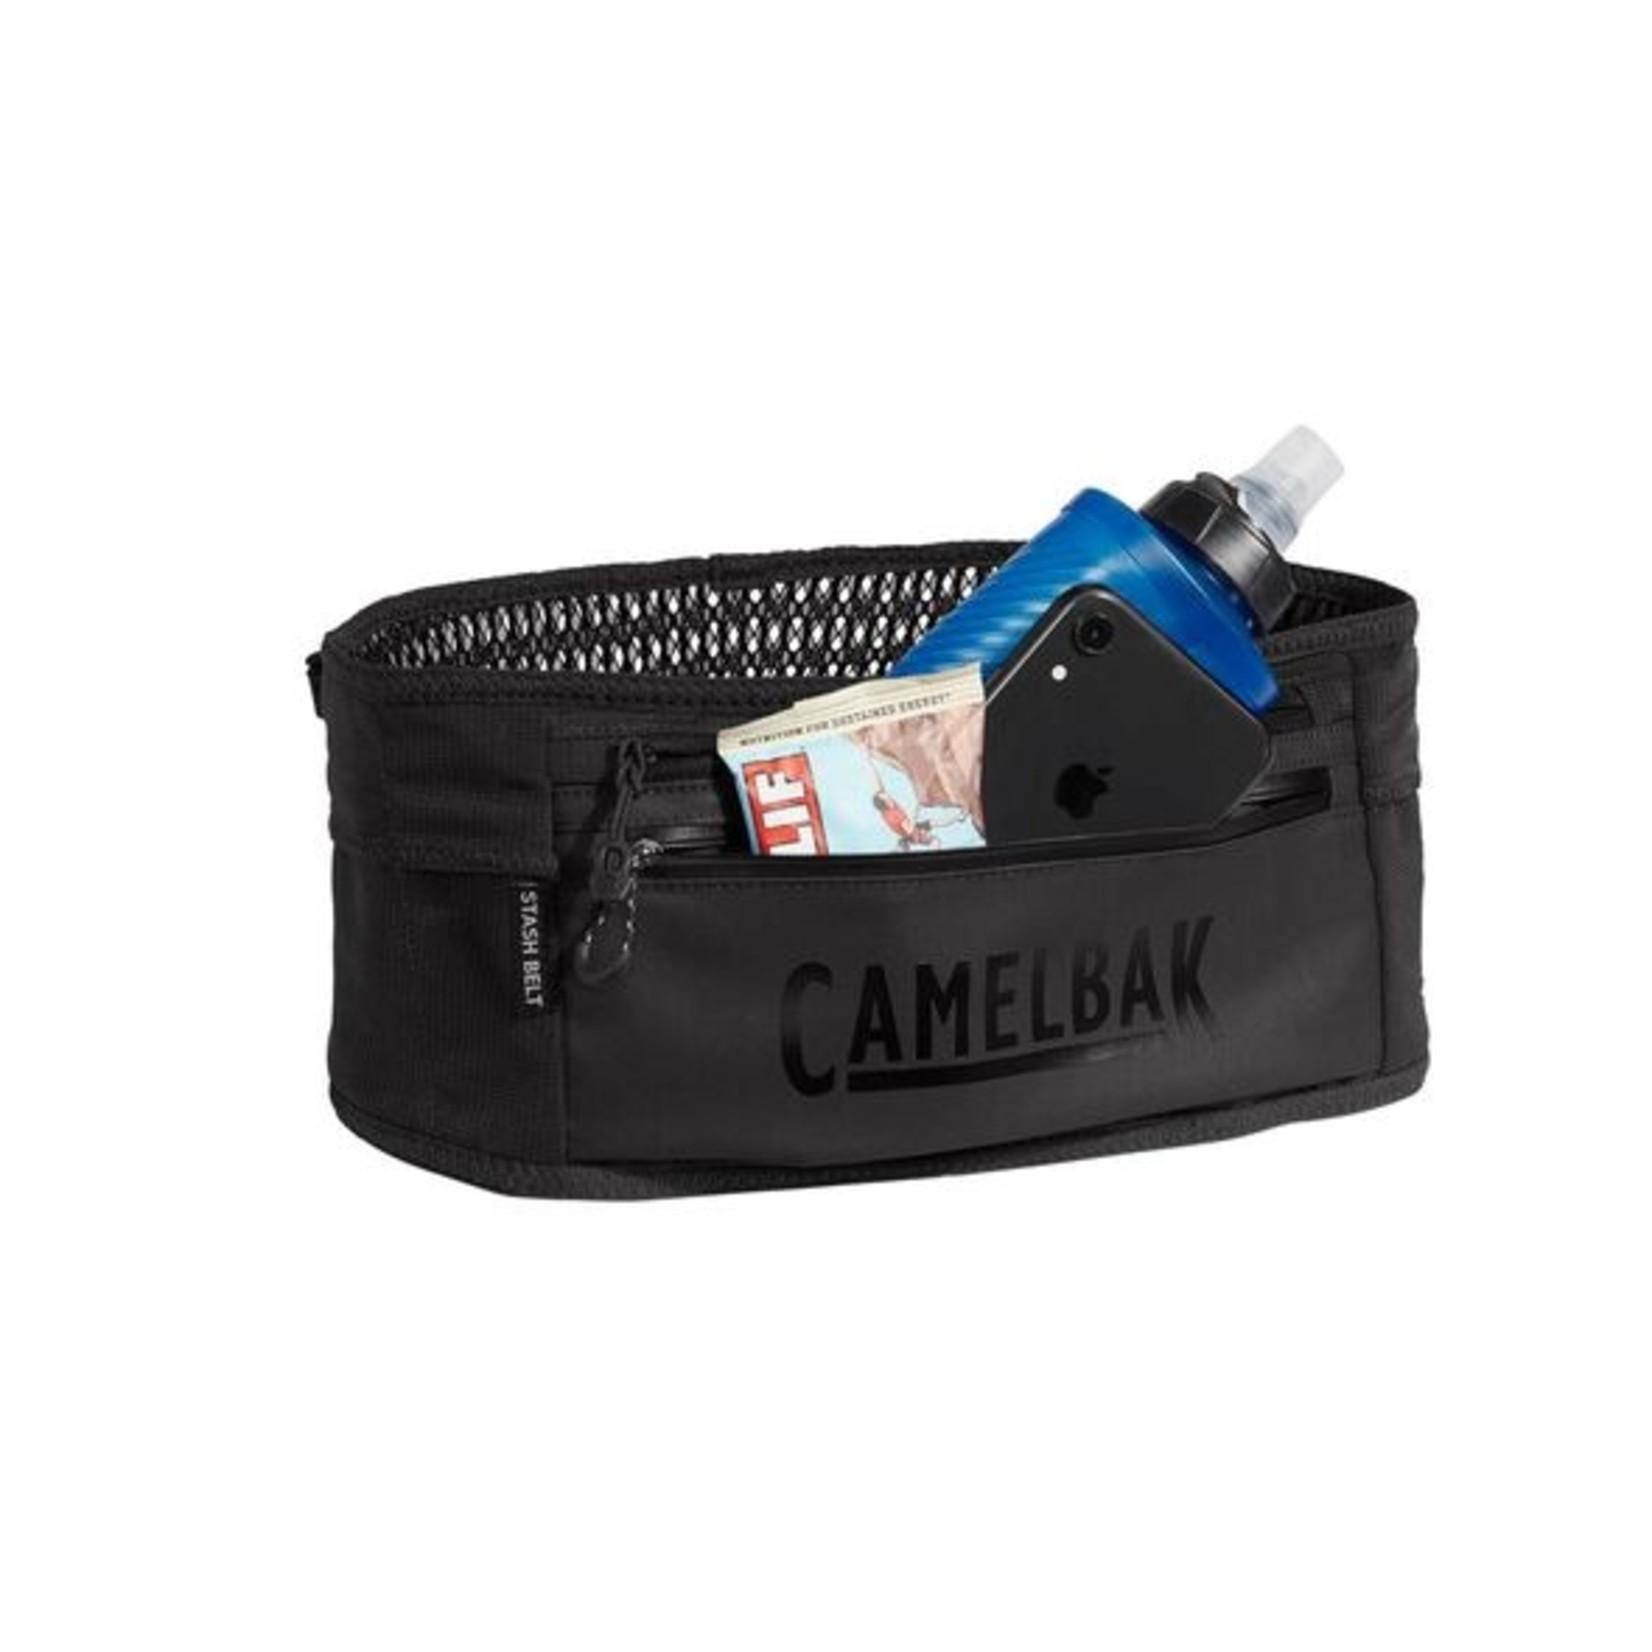 CAMELBAK Camelbak, Stash Belt (Medium)